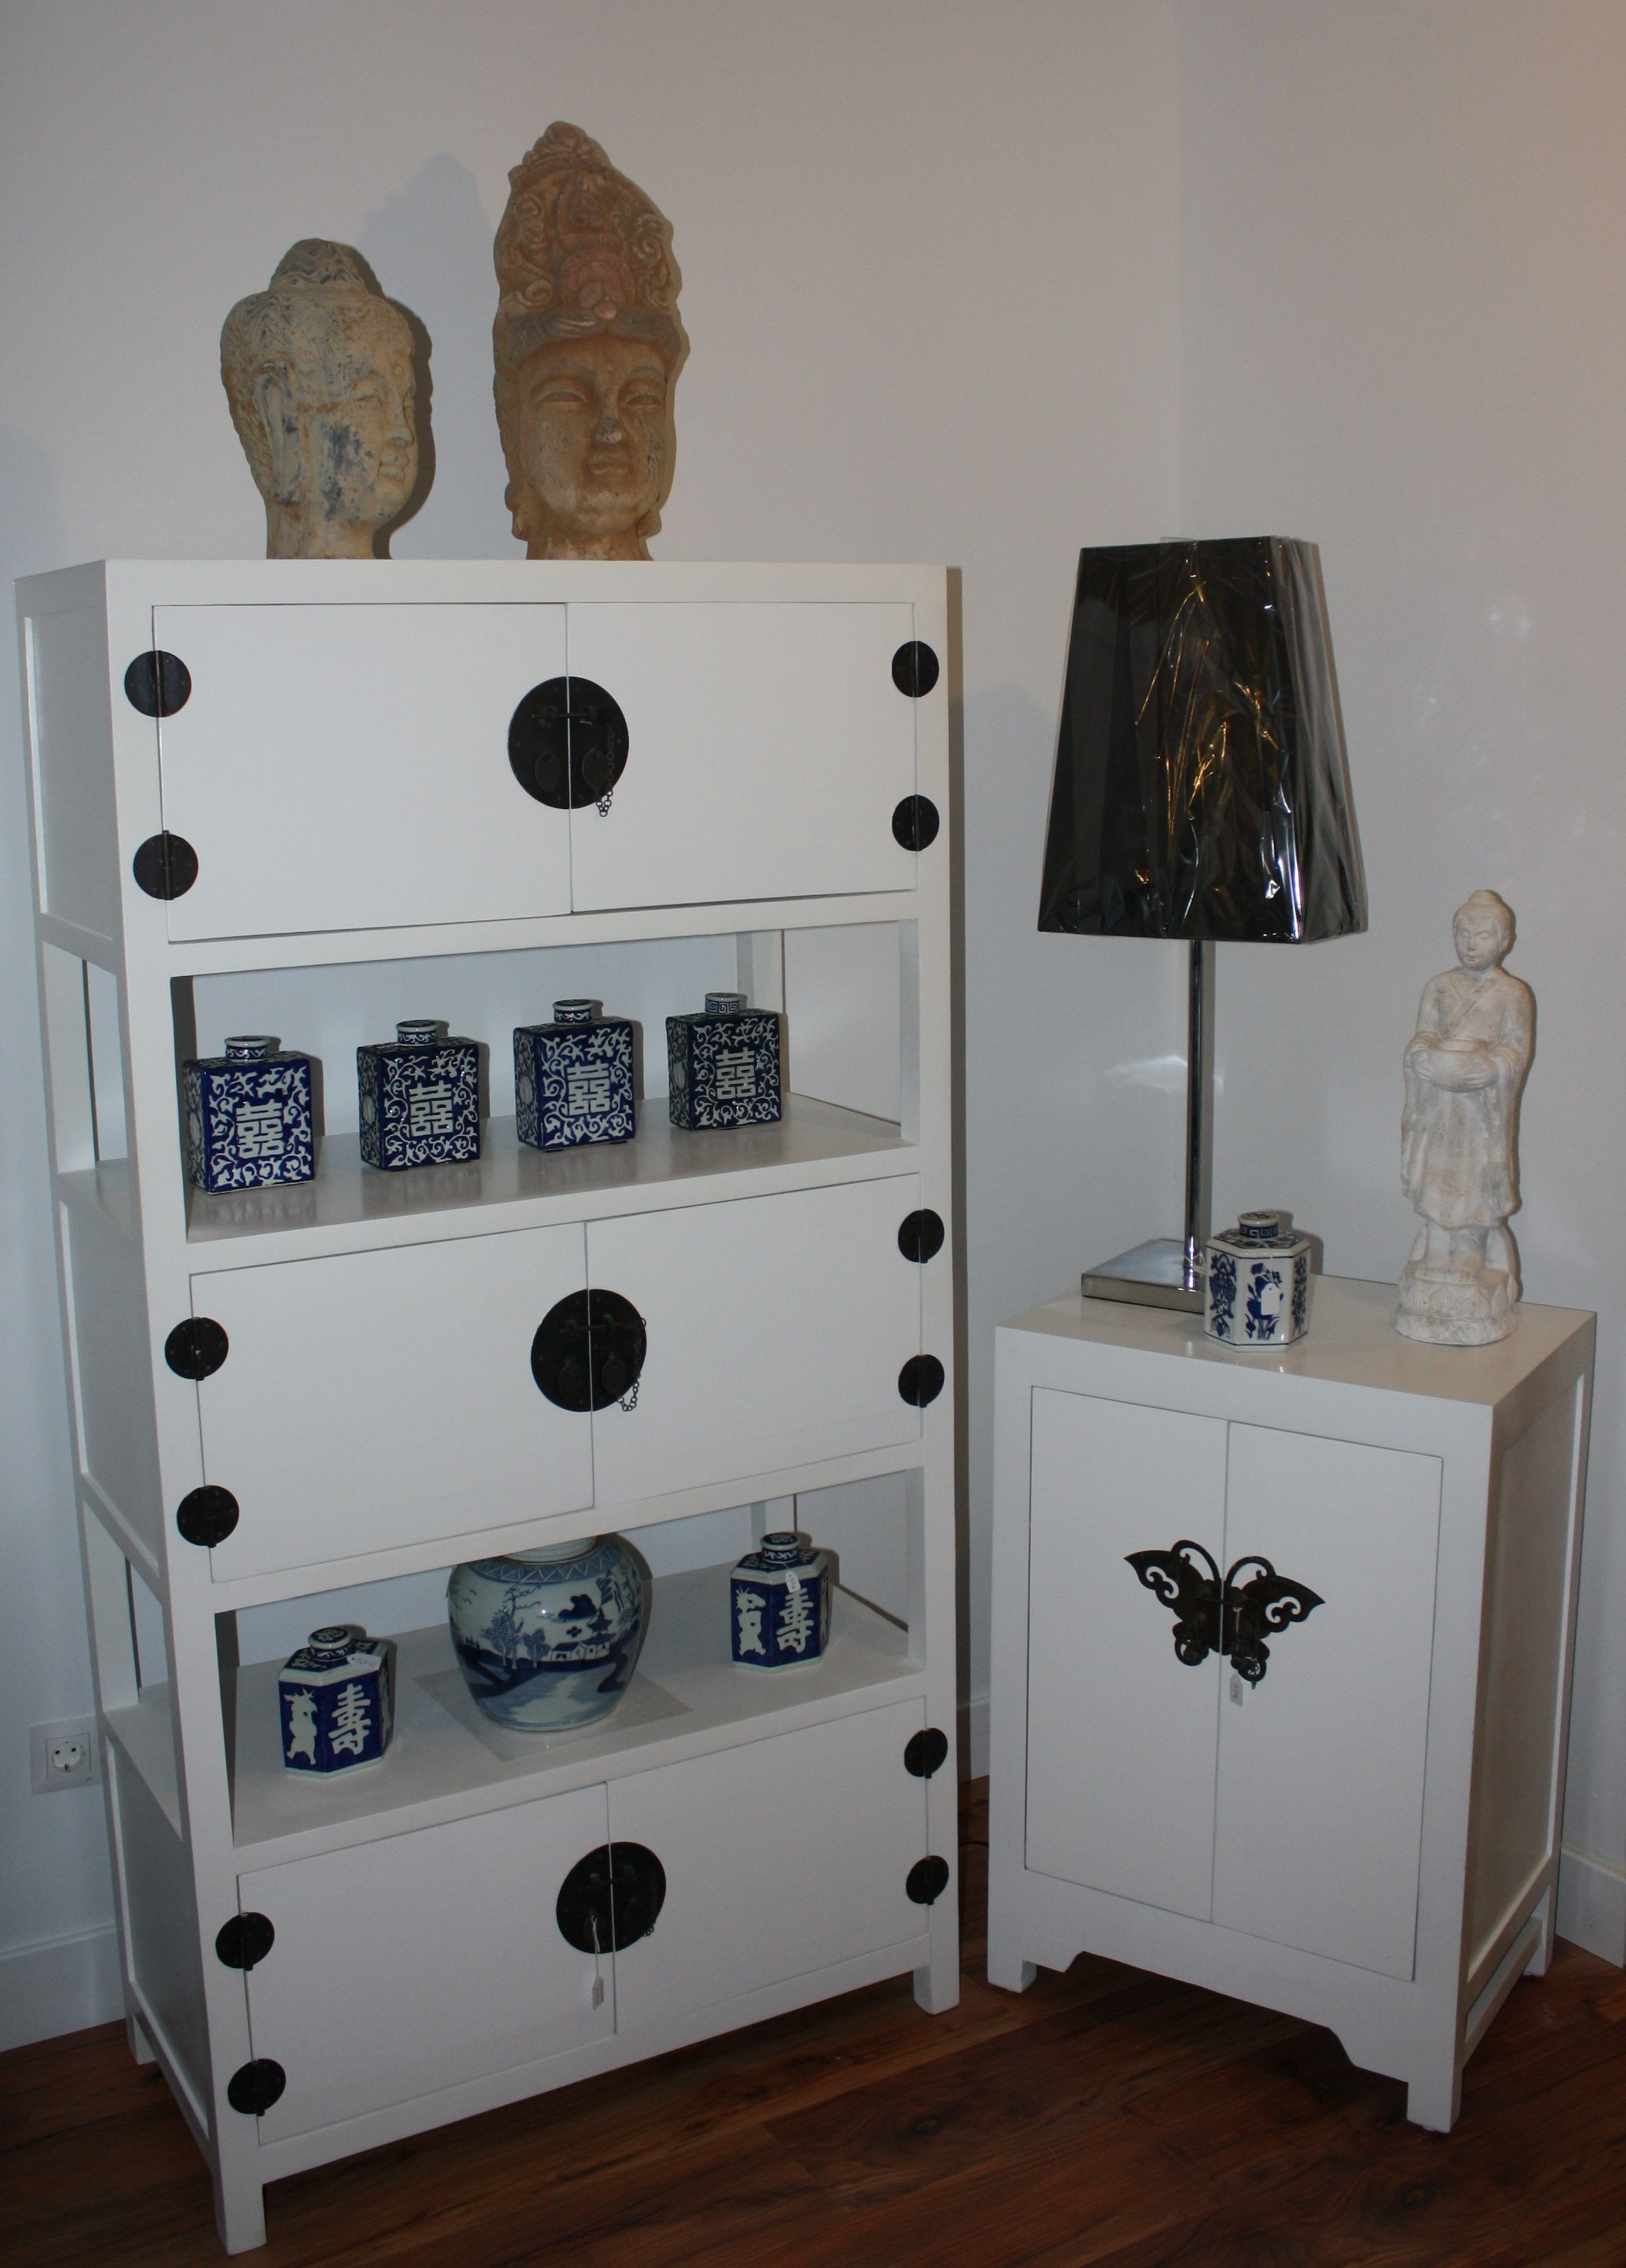 Muebles orientales madrid asitrade asitrade muebles de importaci n chinos - Muebles orientales madrid ...